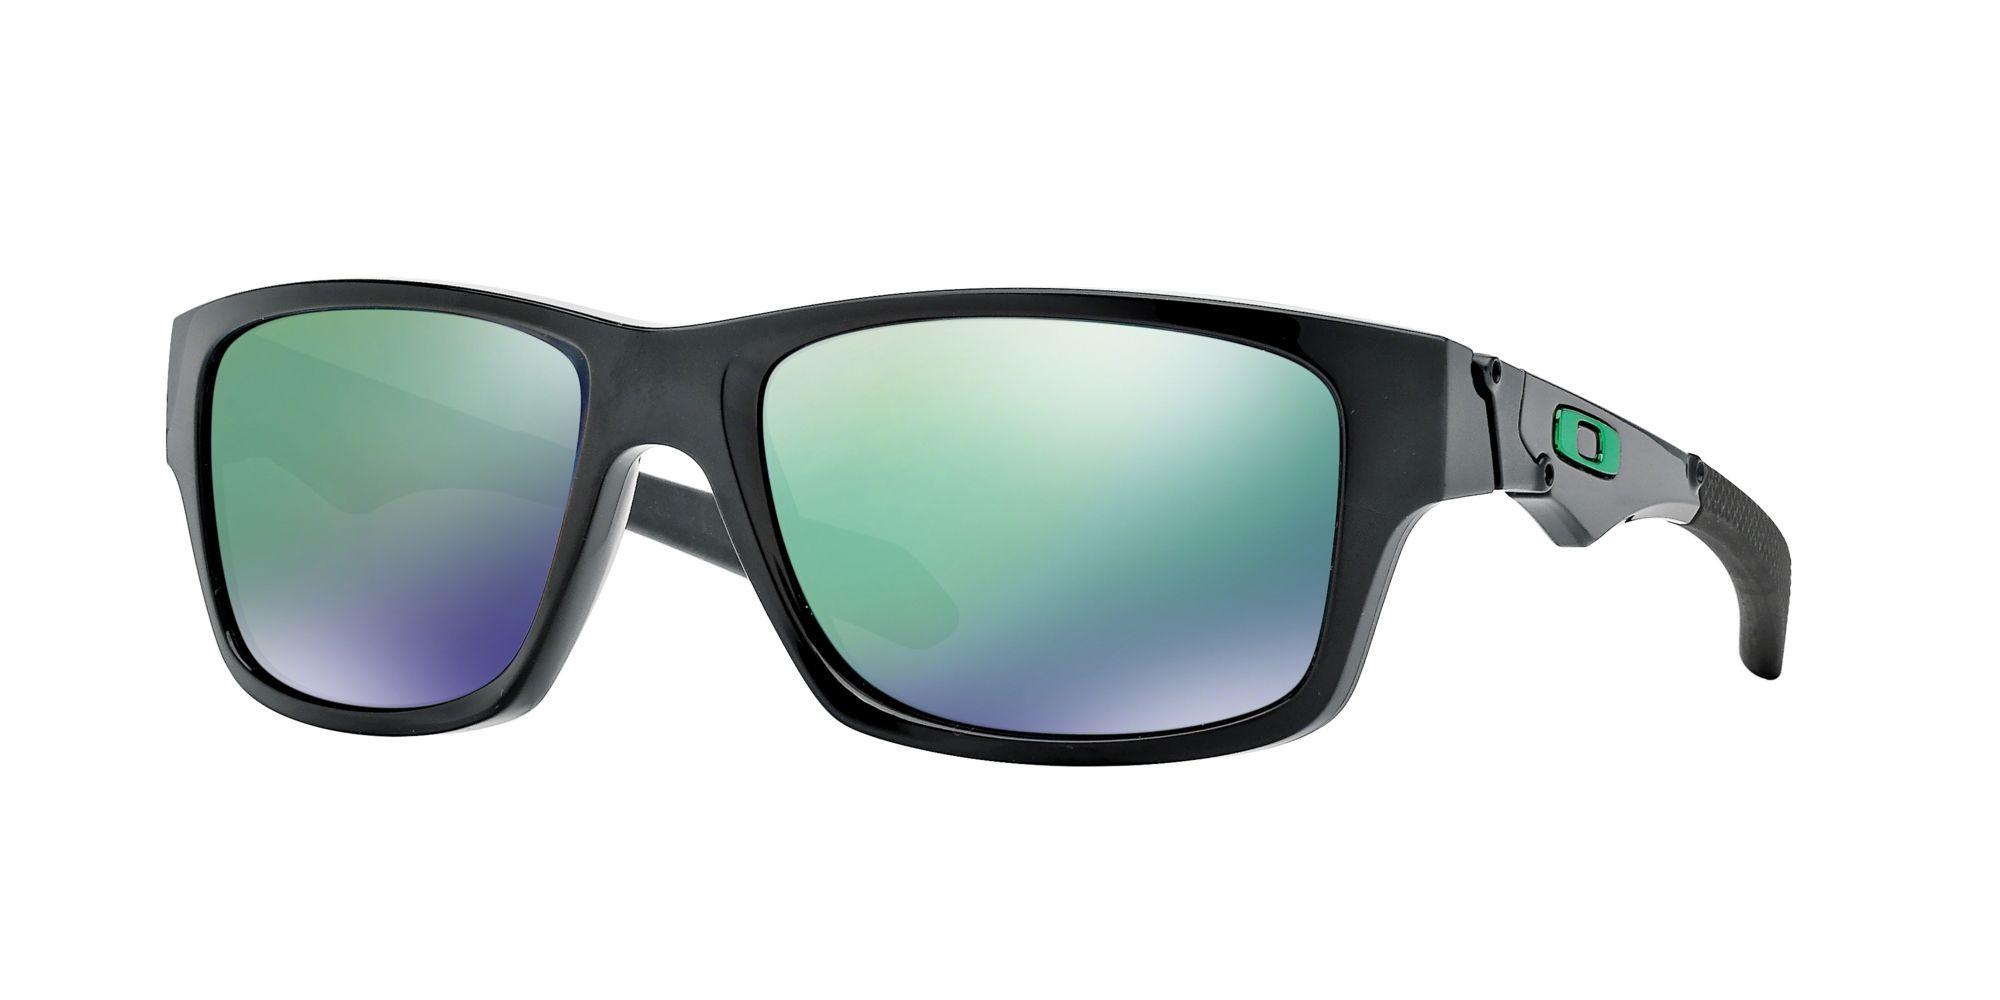 Oakley Medium Men Rectangle Sunglasses - Oo9135-05